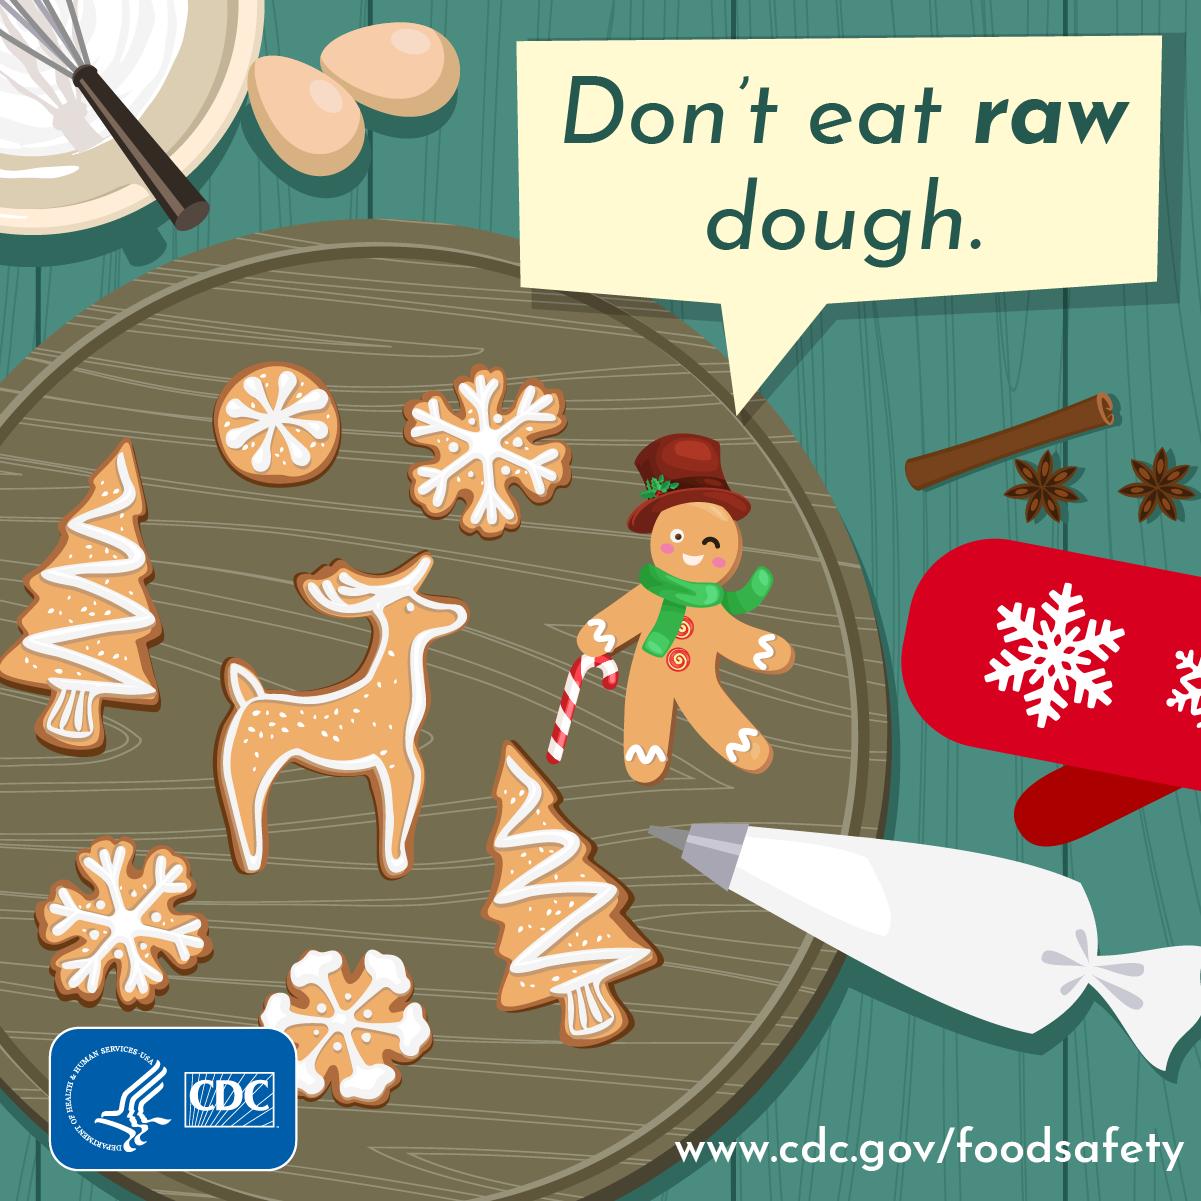 Don't eat raw dough